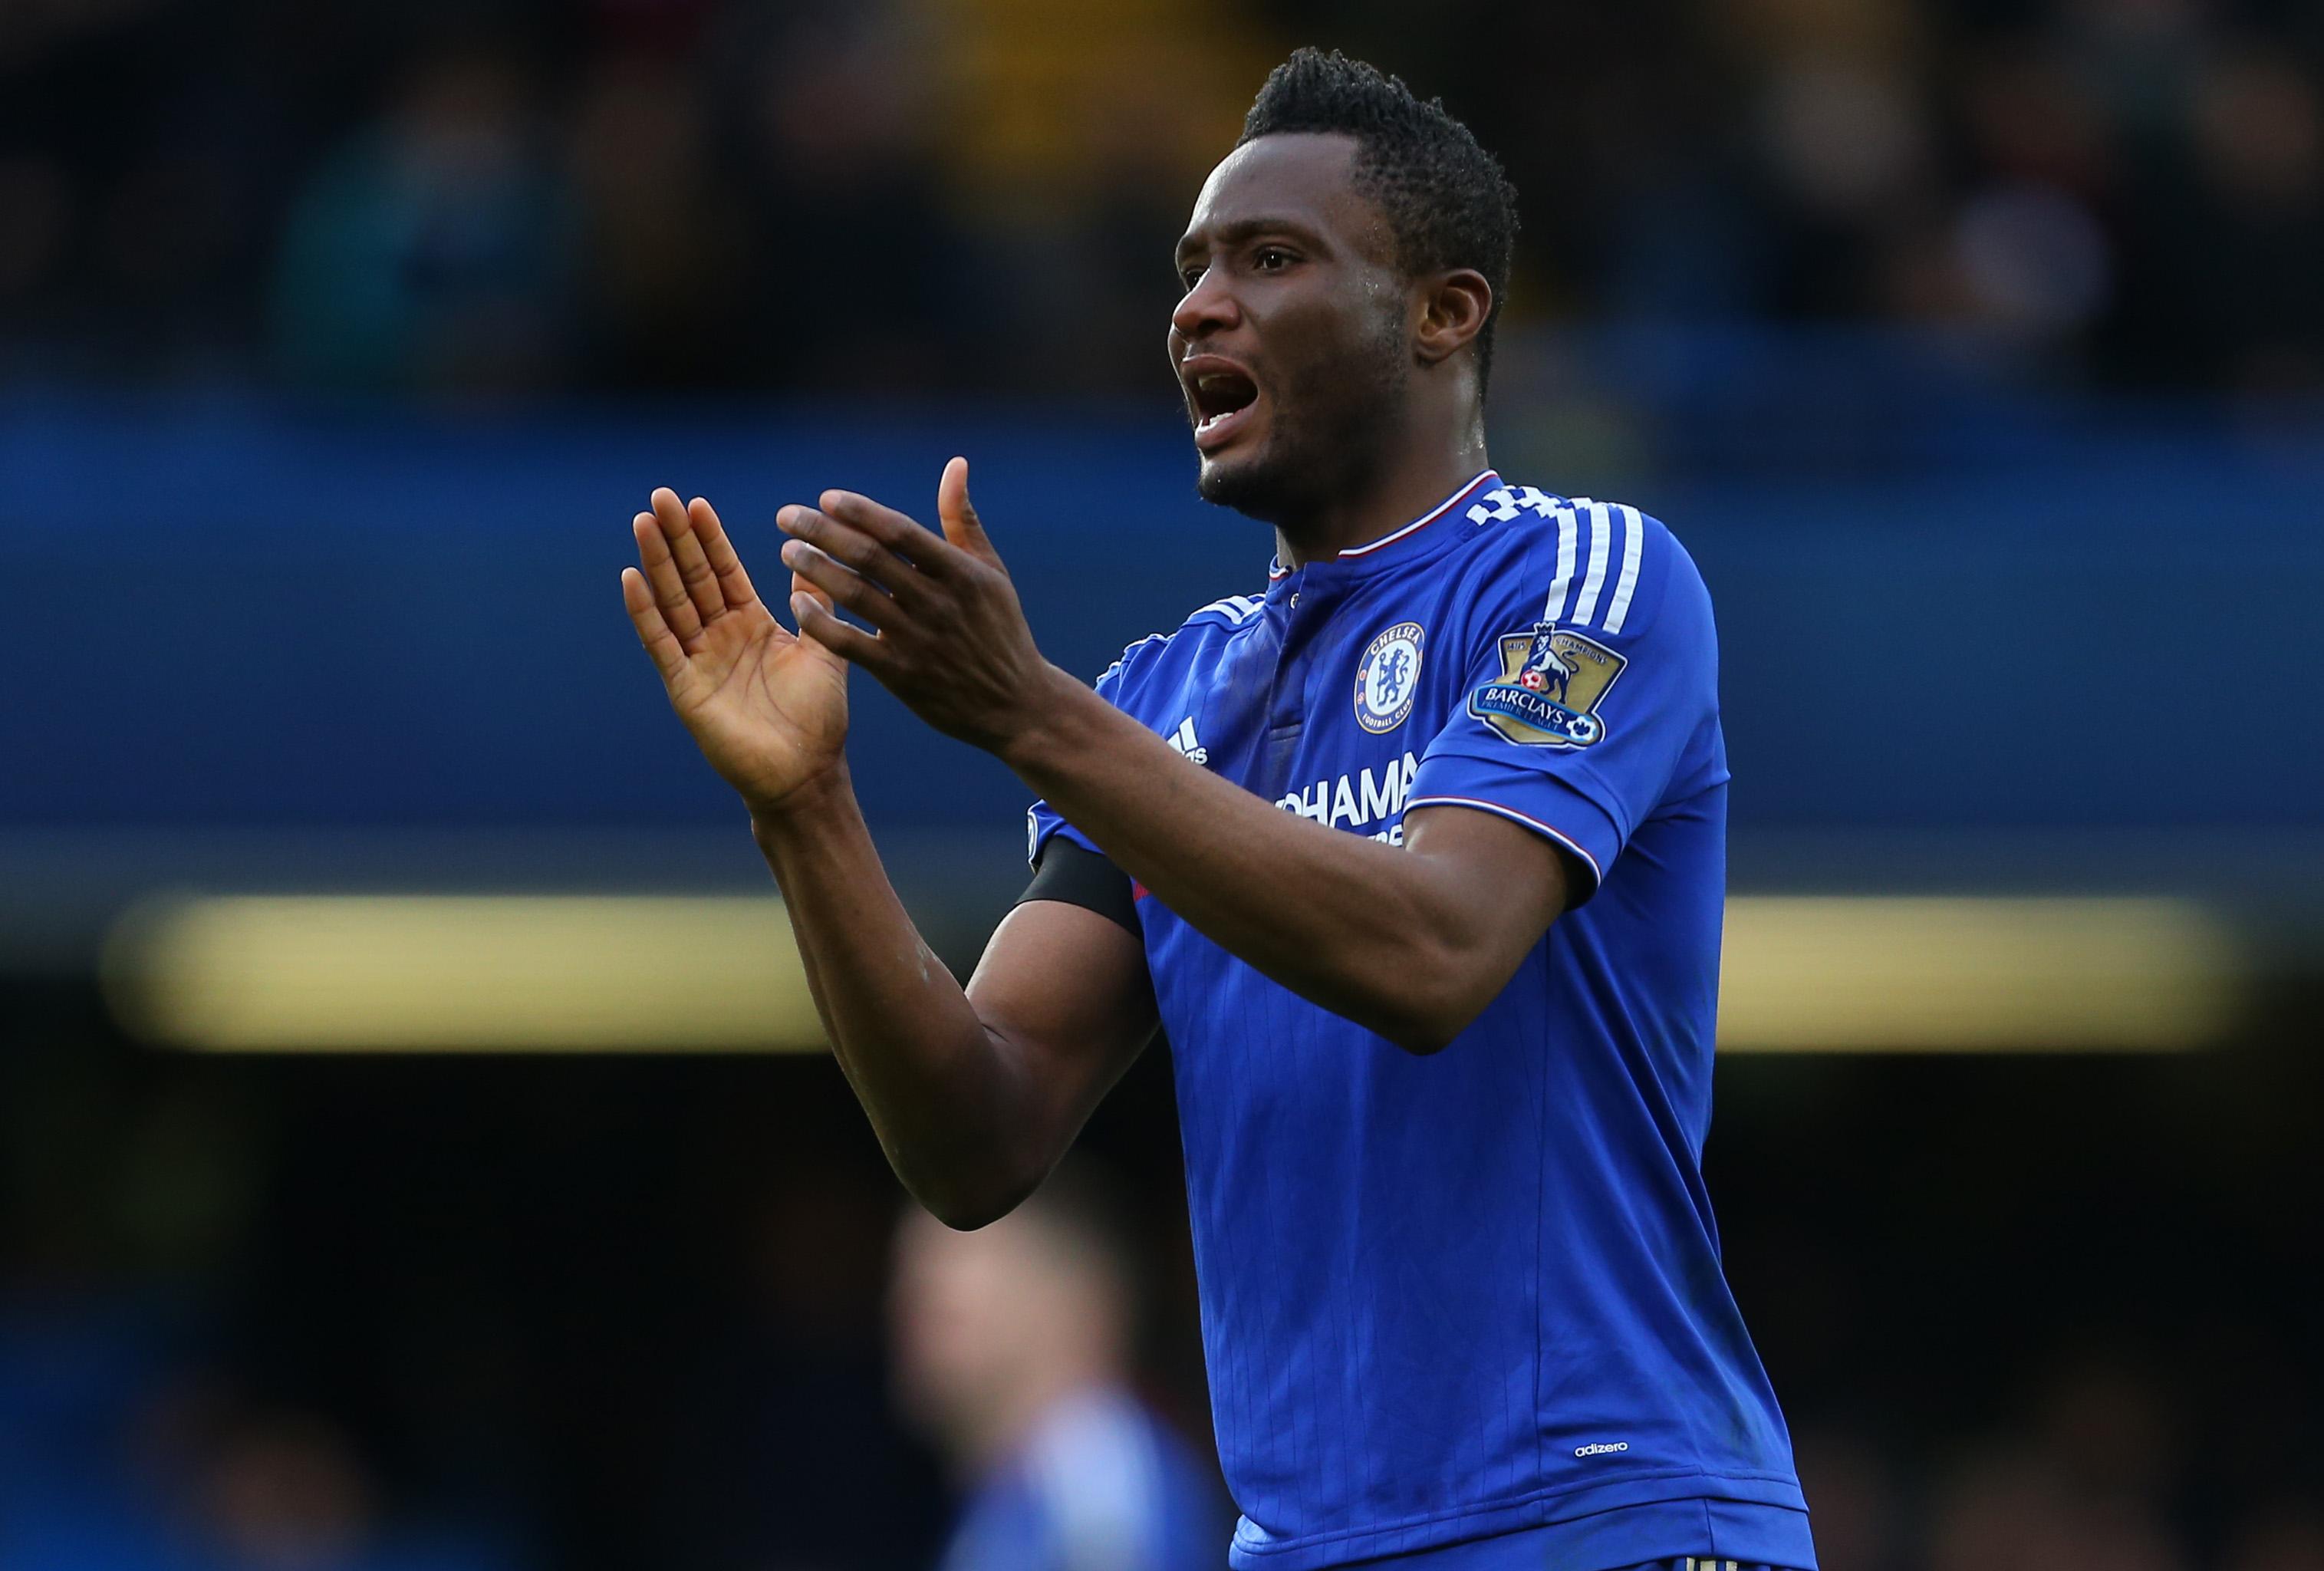 Chelsea ace John Obi Mikel named in Nigeria Olympics squad